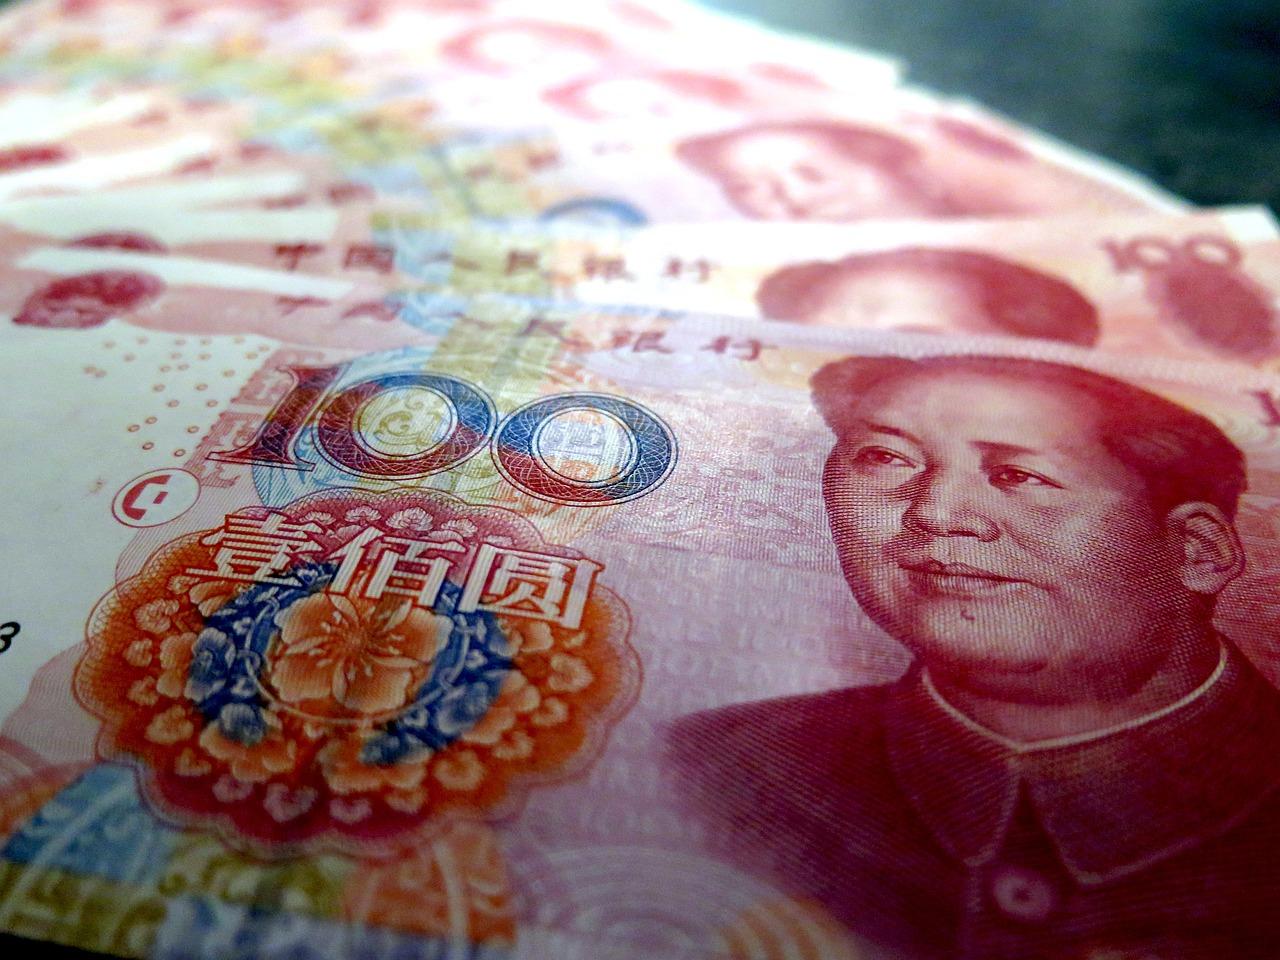 Briefing: China's venture capital deals plummet in second quarter